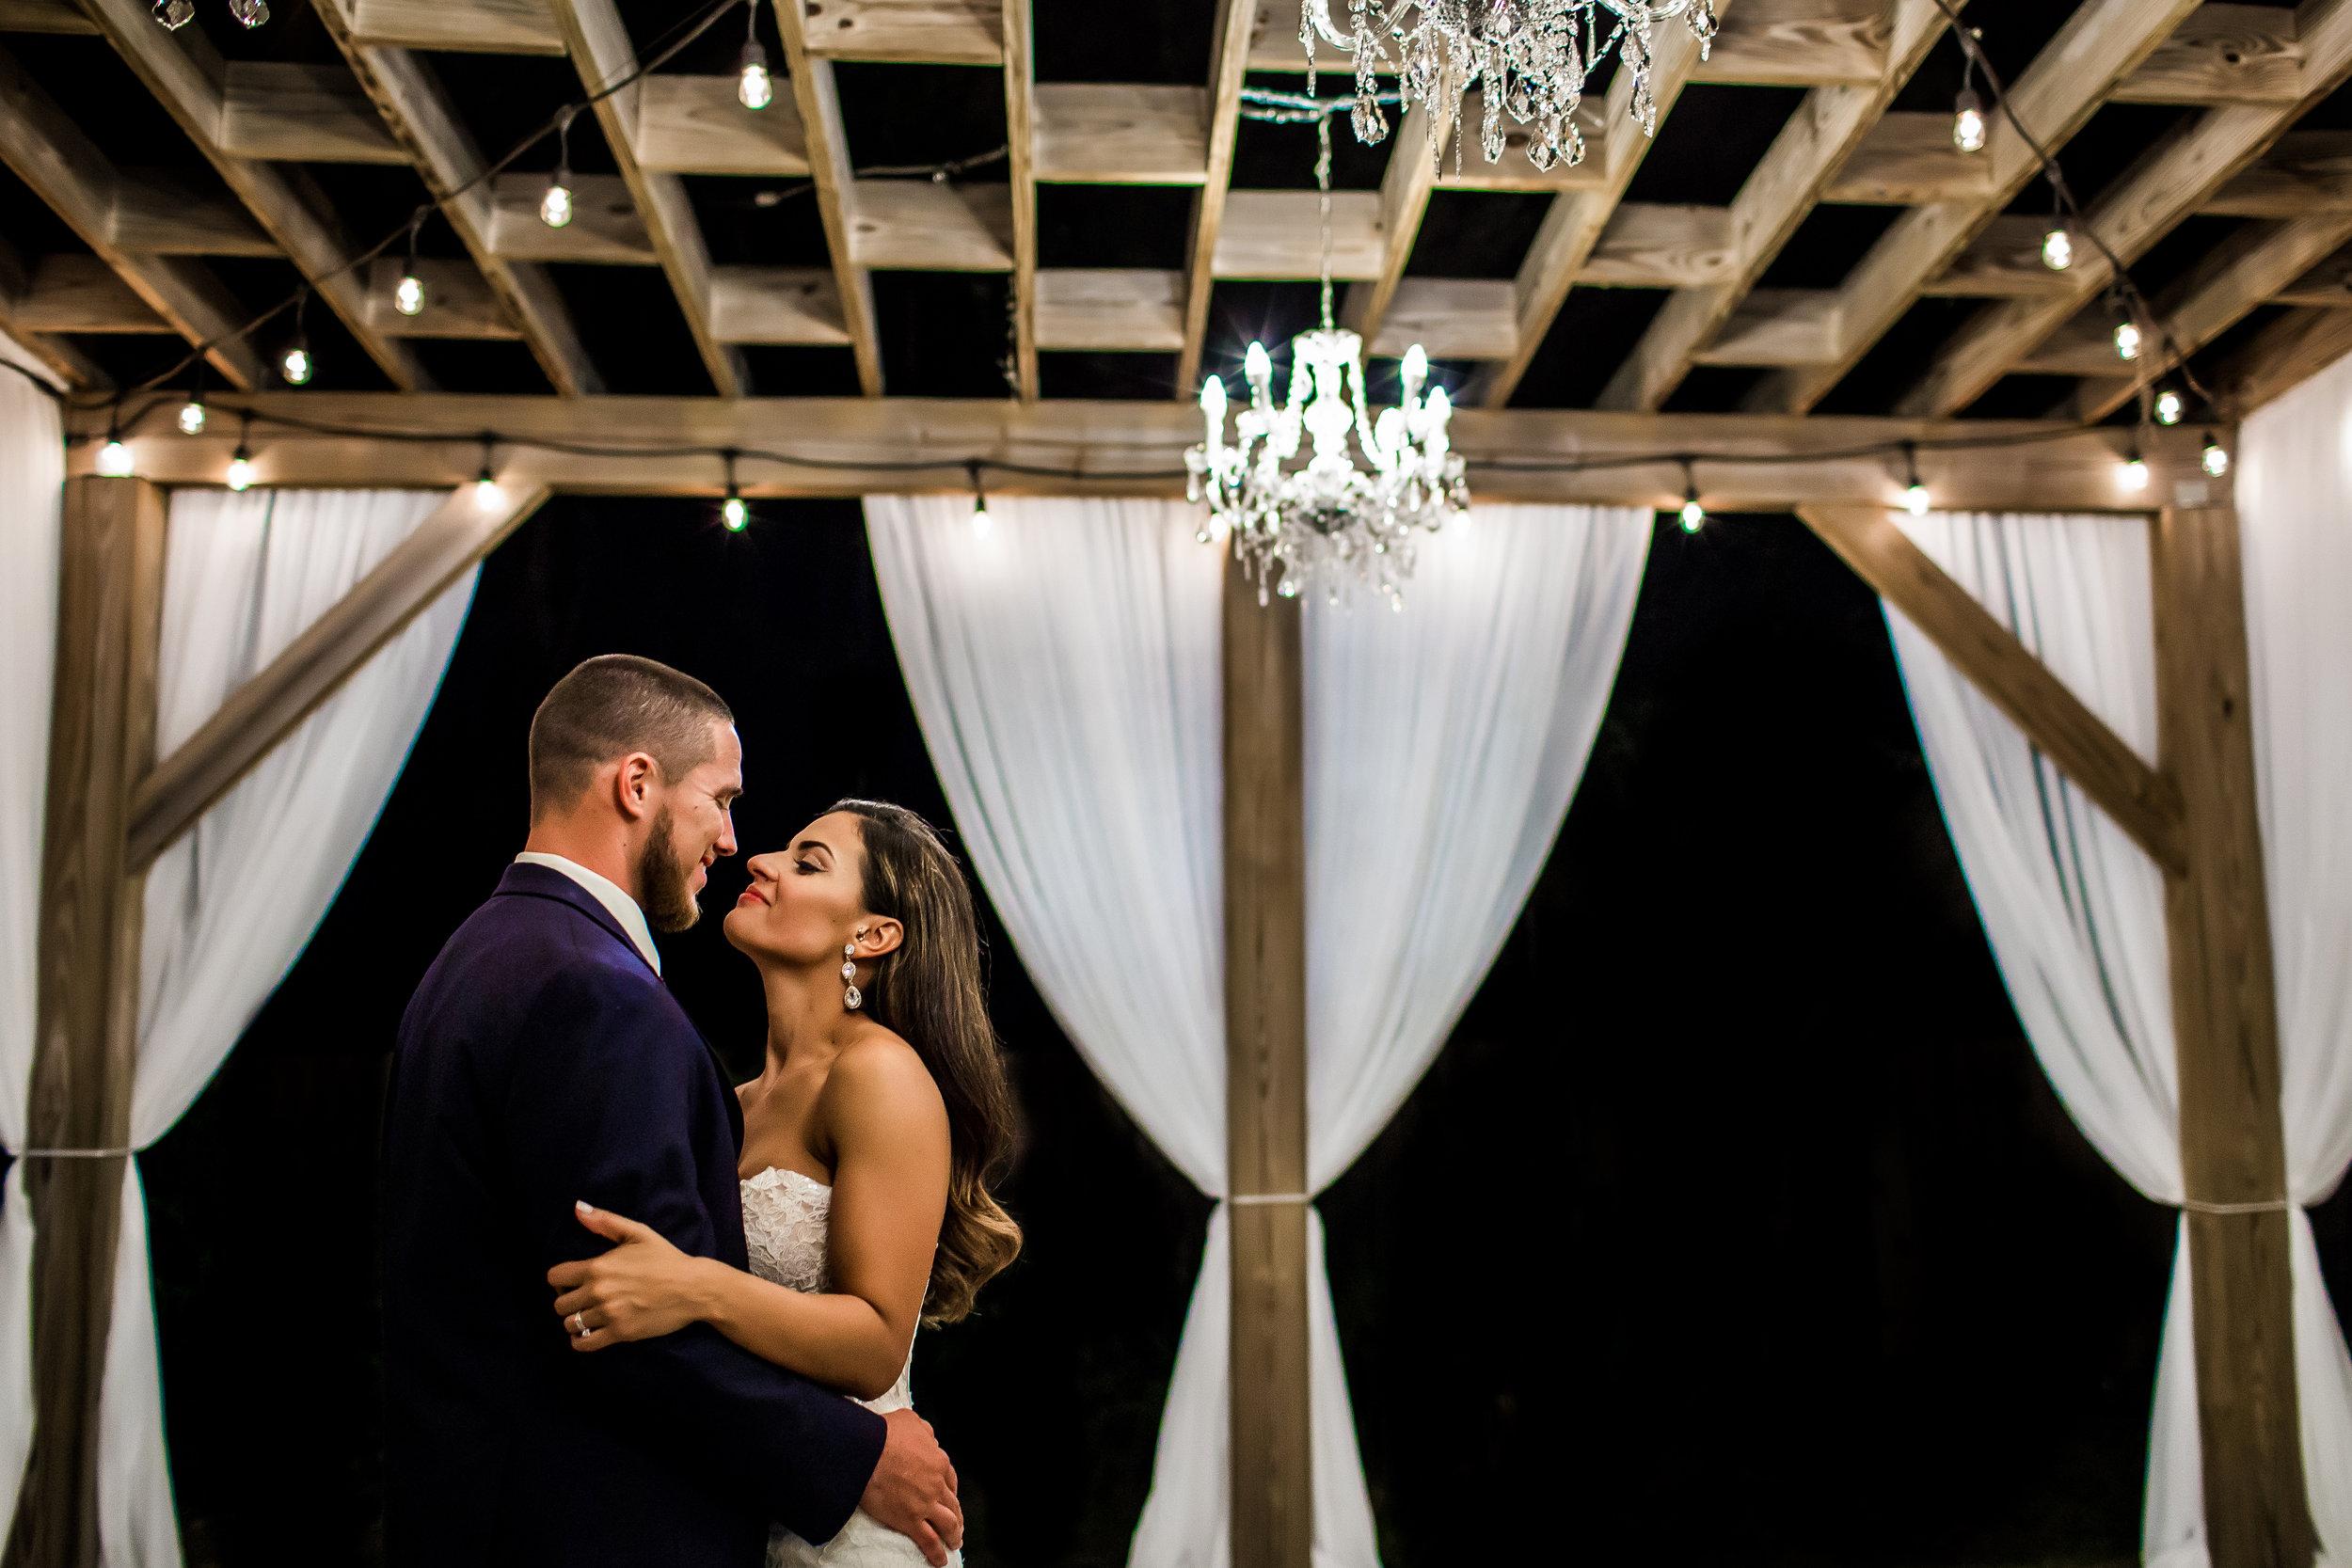 Bakers ranch_weddings_all inclusive (6).jpg